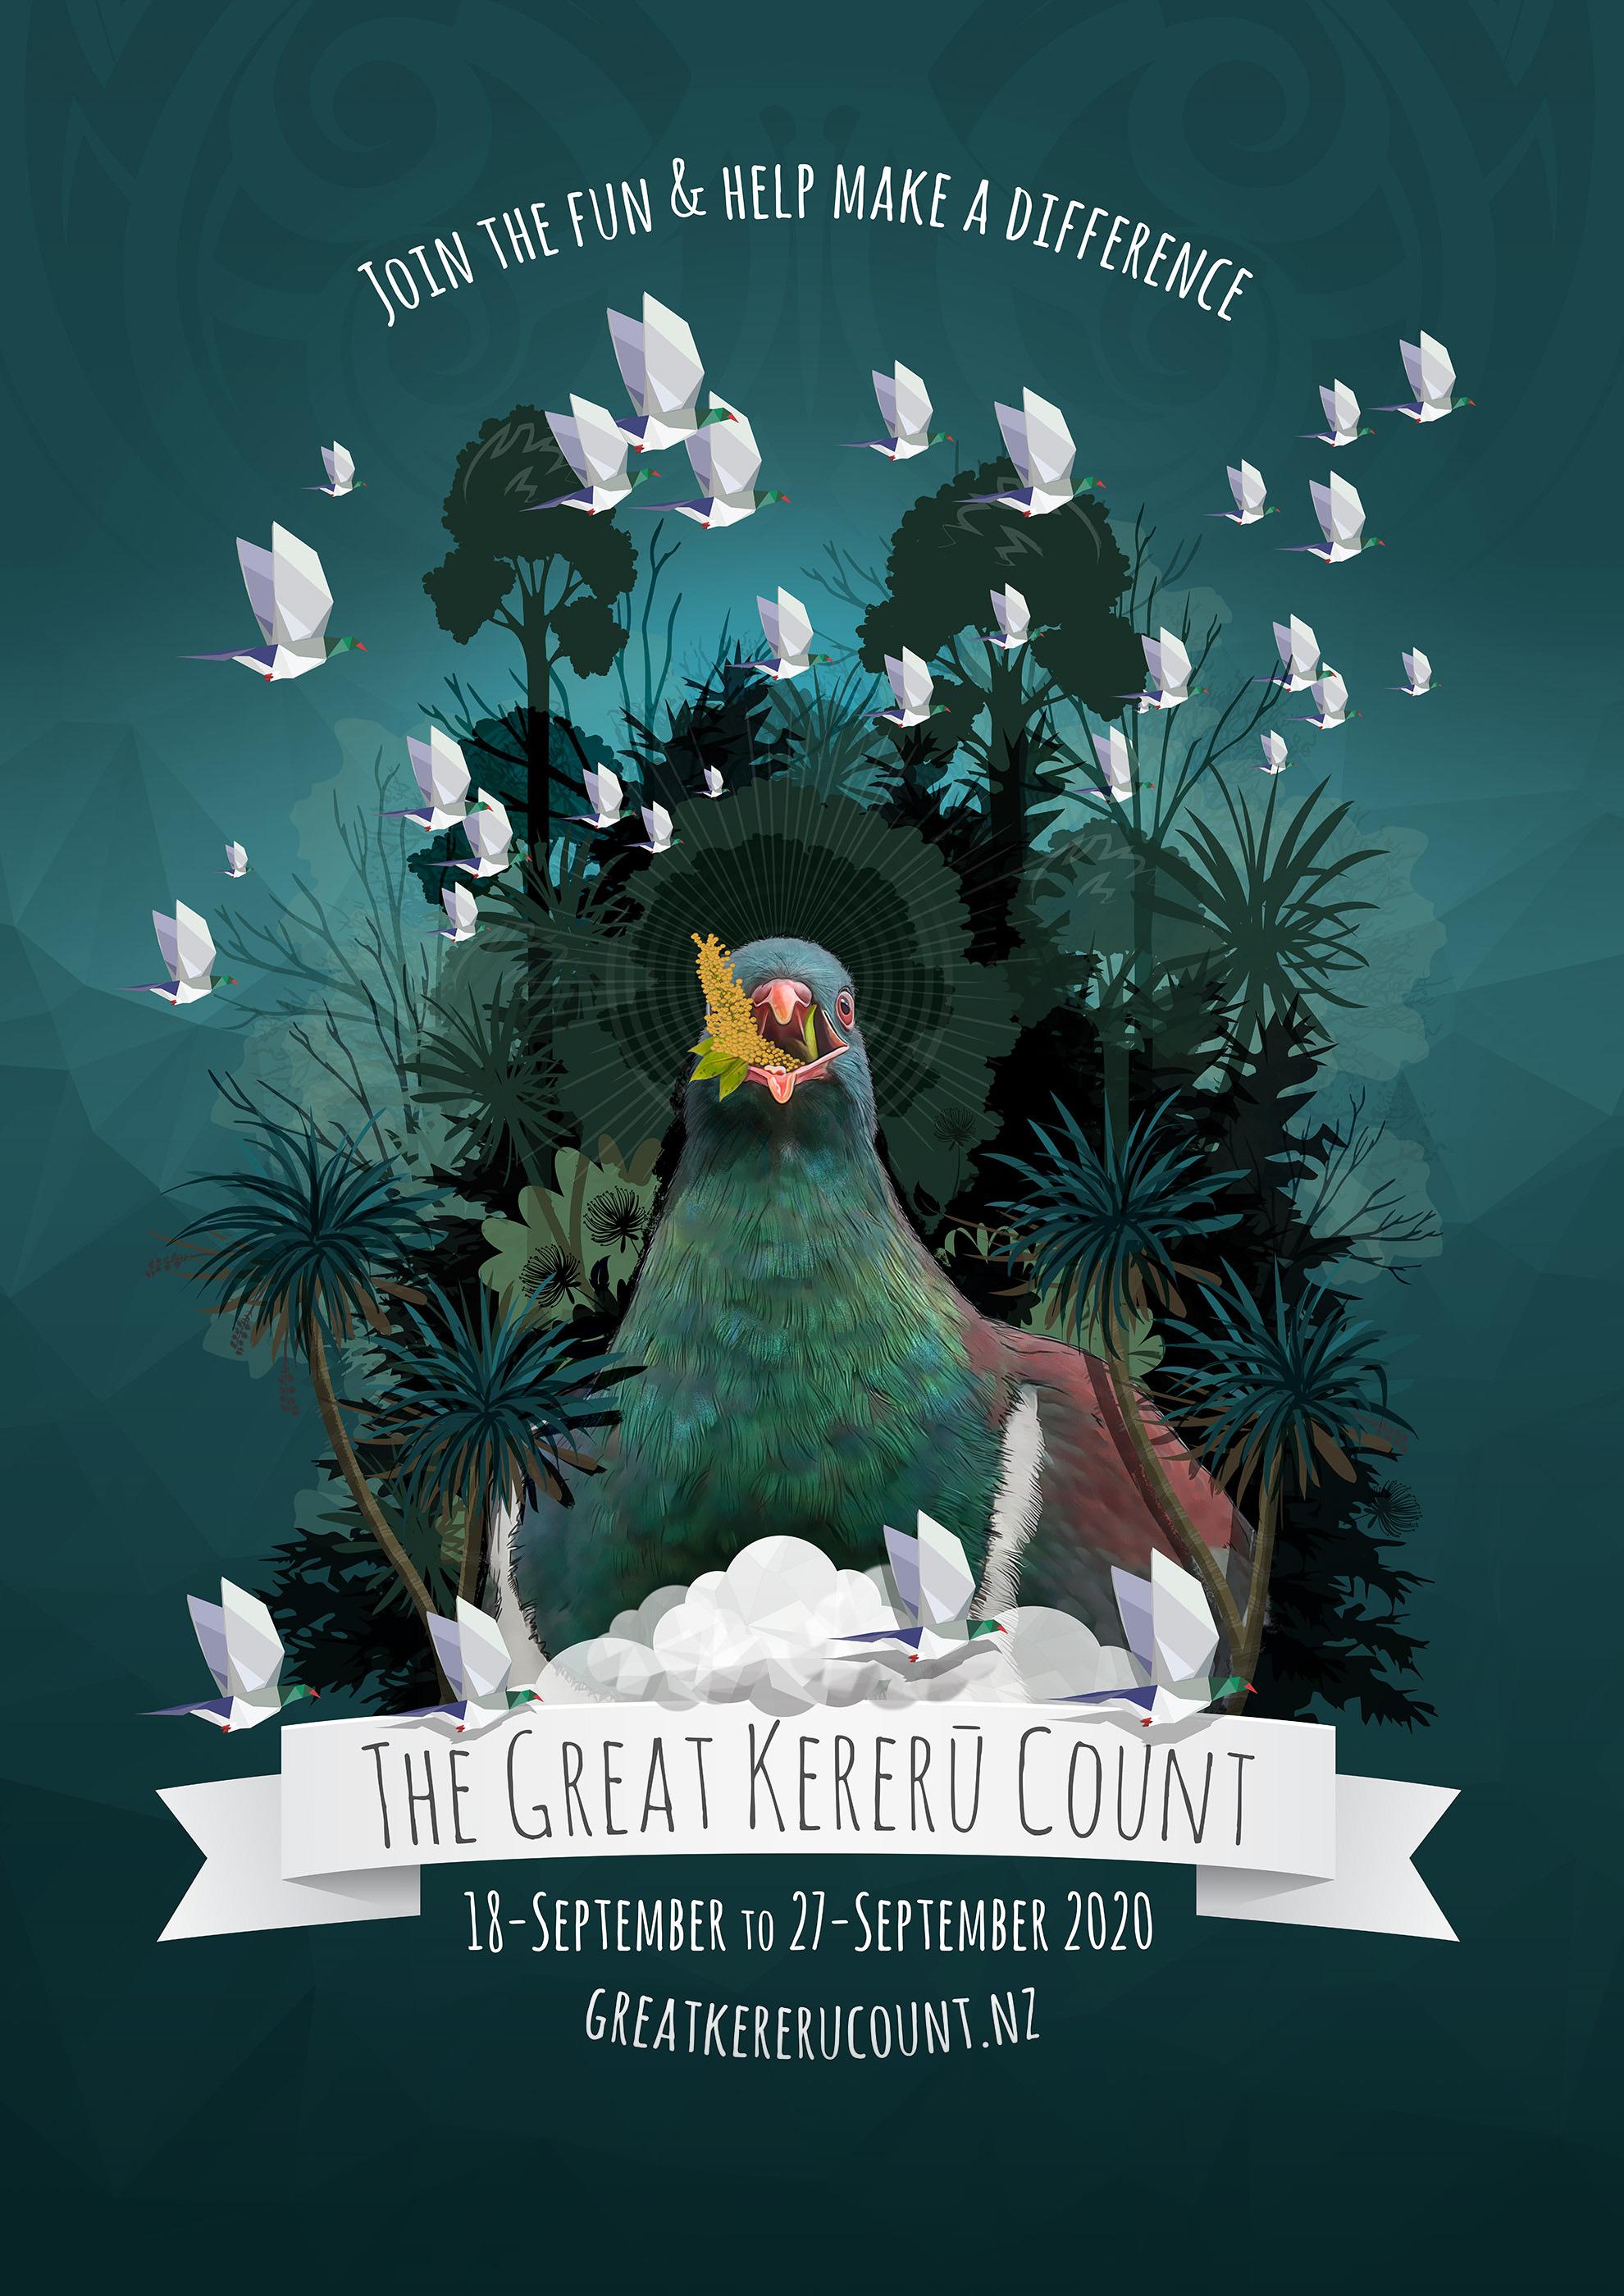 Great Kereru Count 2020